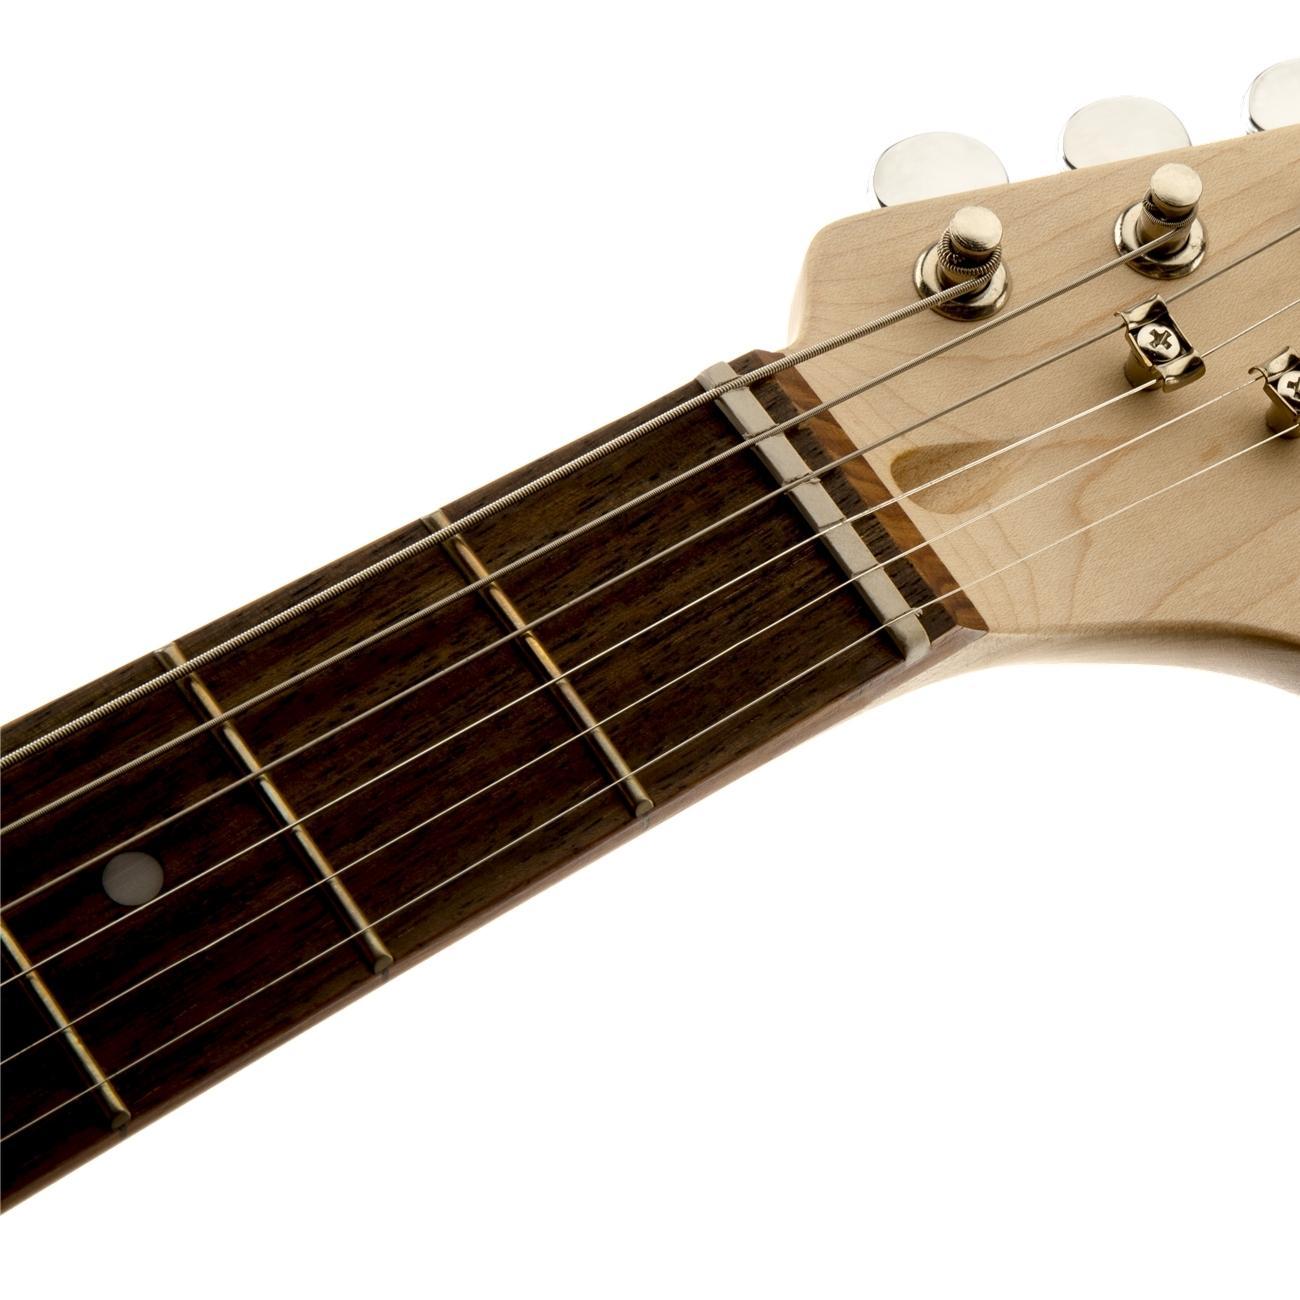 squier by fender mini strat beginner electric guitar rosewood fingerboard black. Black Bedroom Furniture Sets. Home Design Ideas